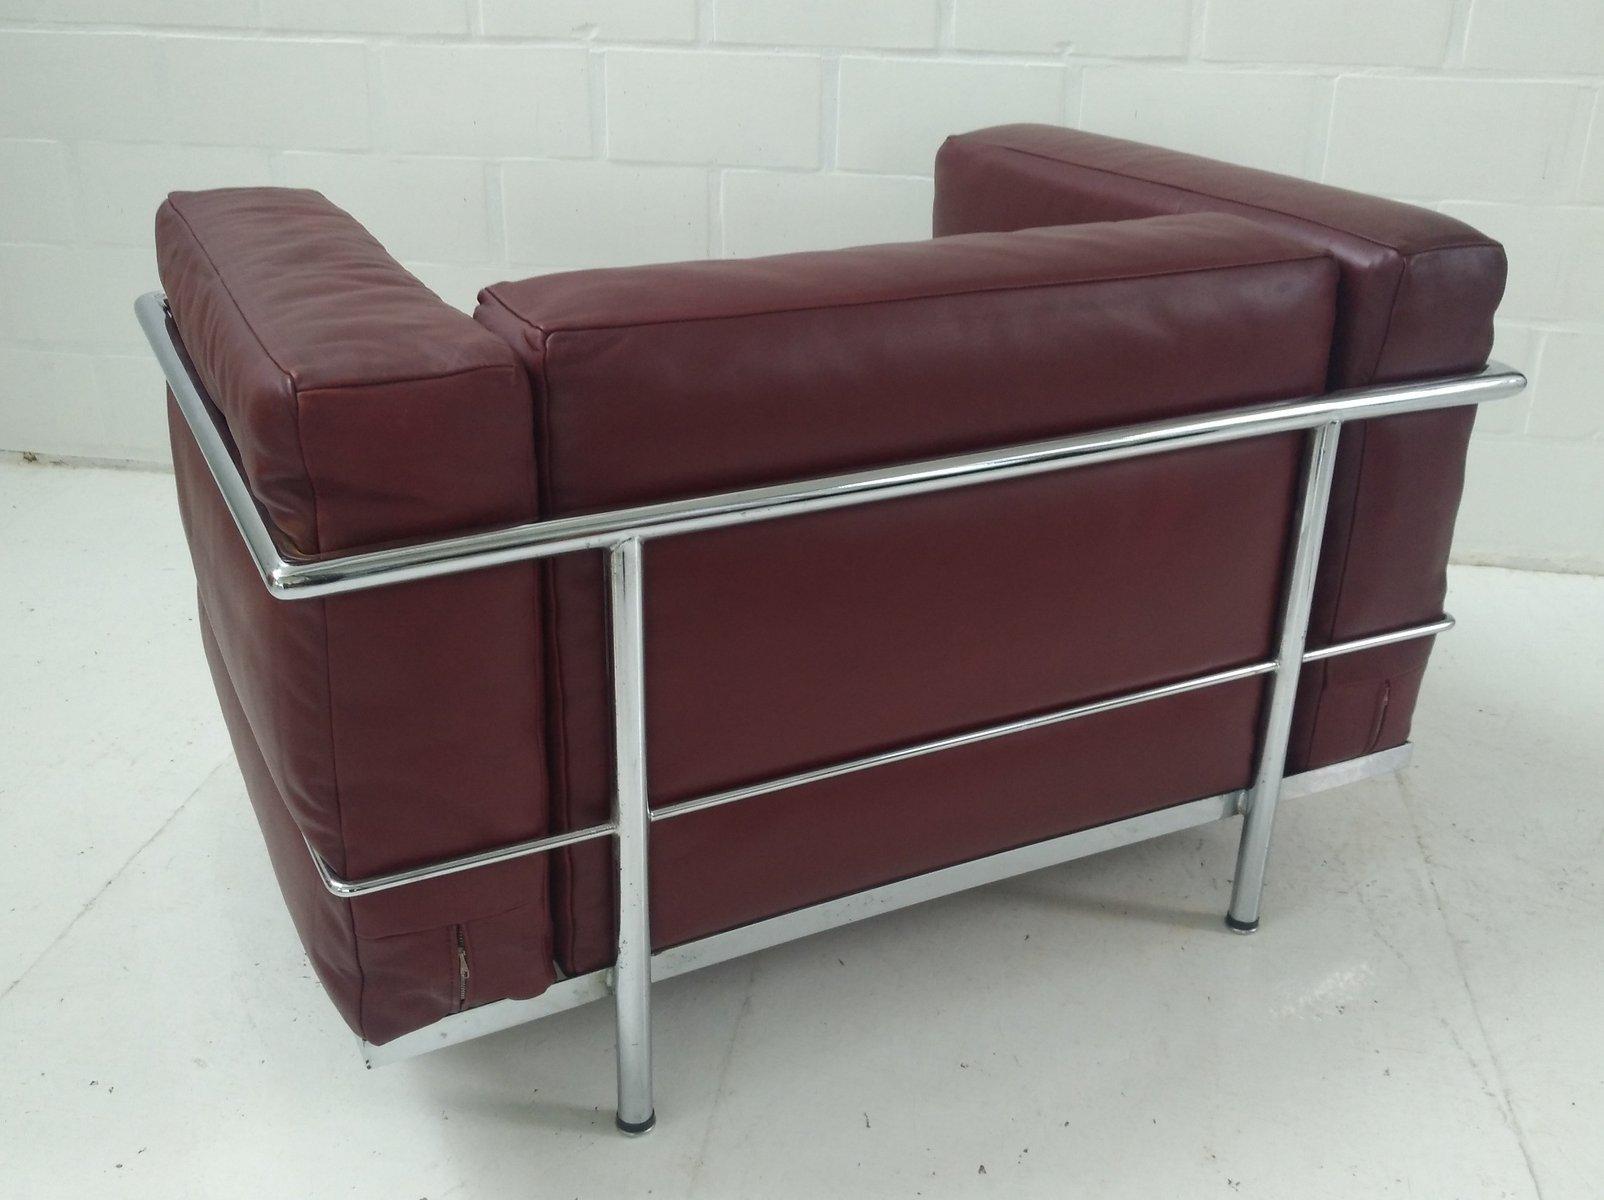 Model Lc101 Lc3 Armchair By Le Corbusier Pierre Jeanneret